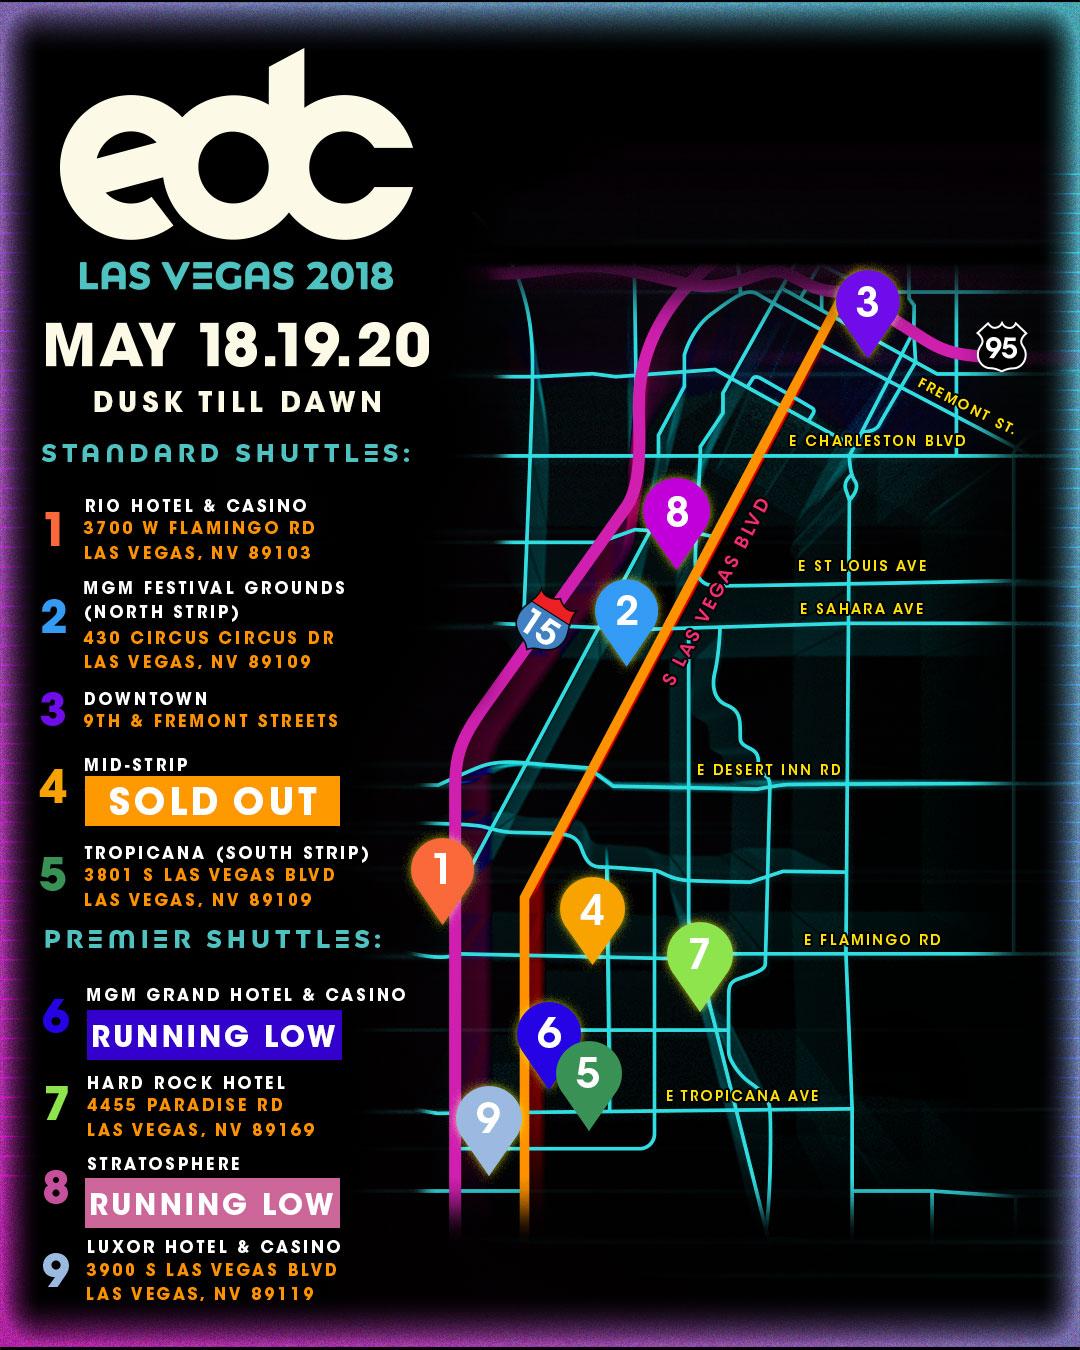 EDC Las Vegas shuttle map